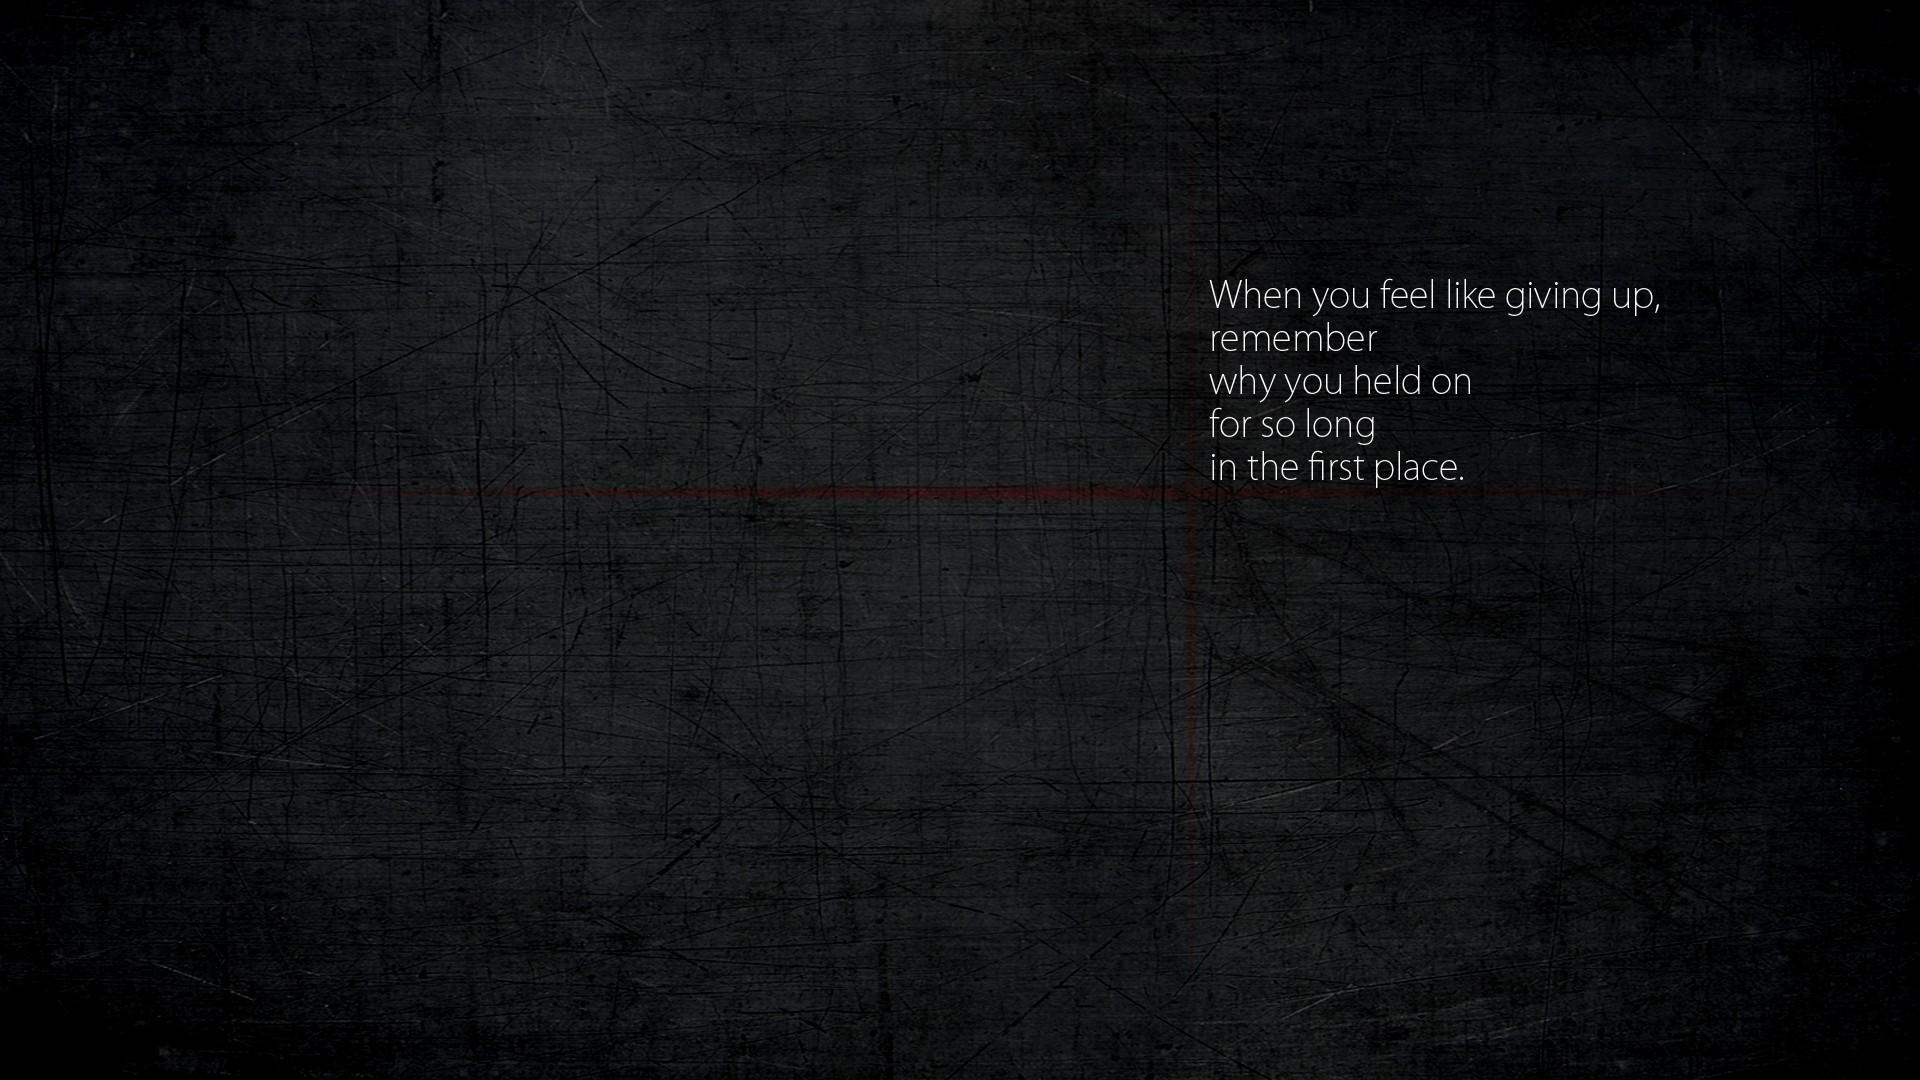 Motivation Desktop Wallpaper Posted By Sarah Sellers